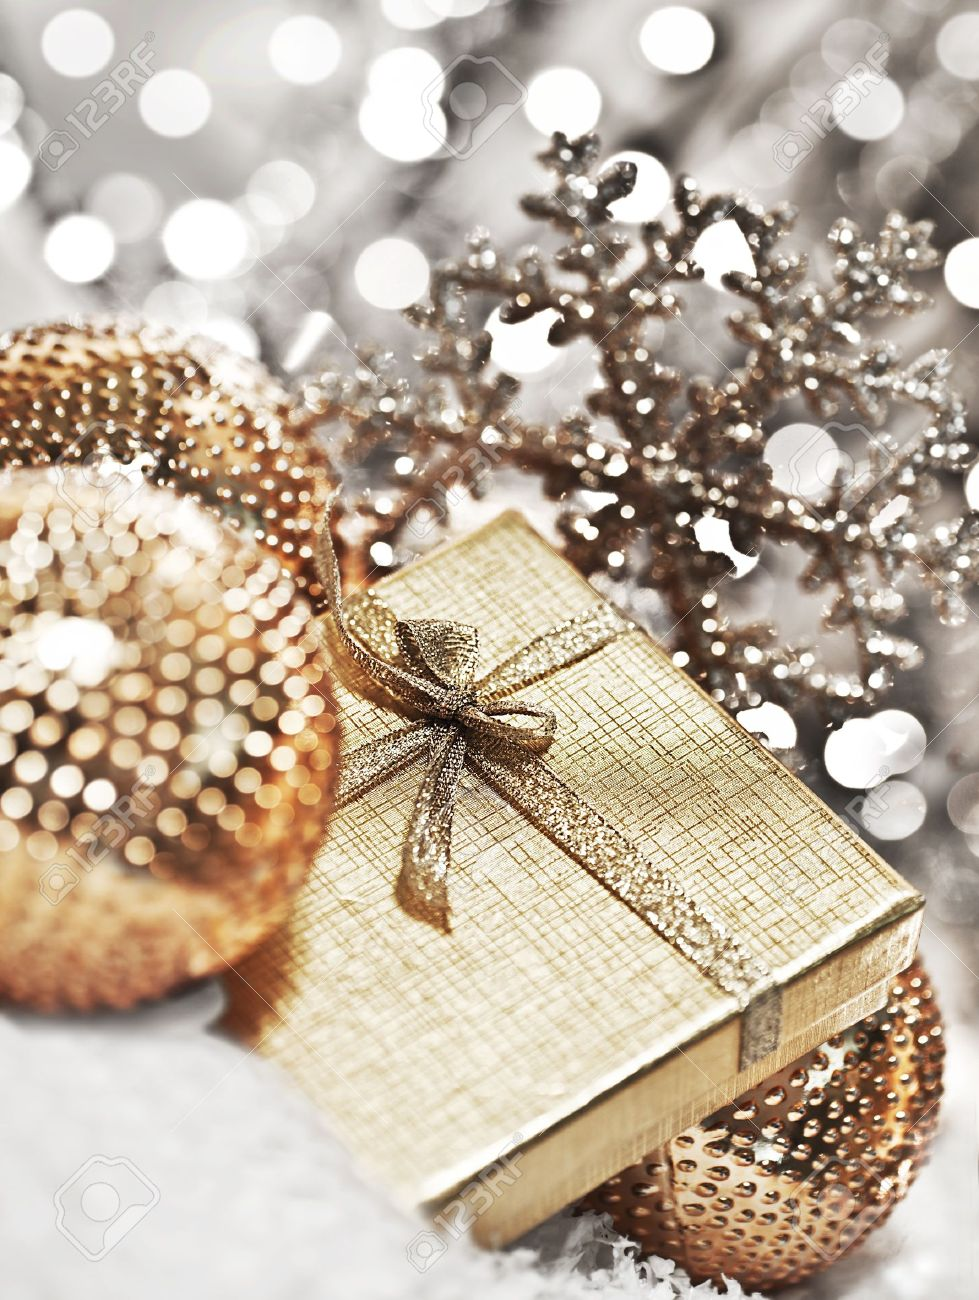 Geschenkschachtel Silber Mit Kugeln Dekorationen Christbaumschmuck